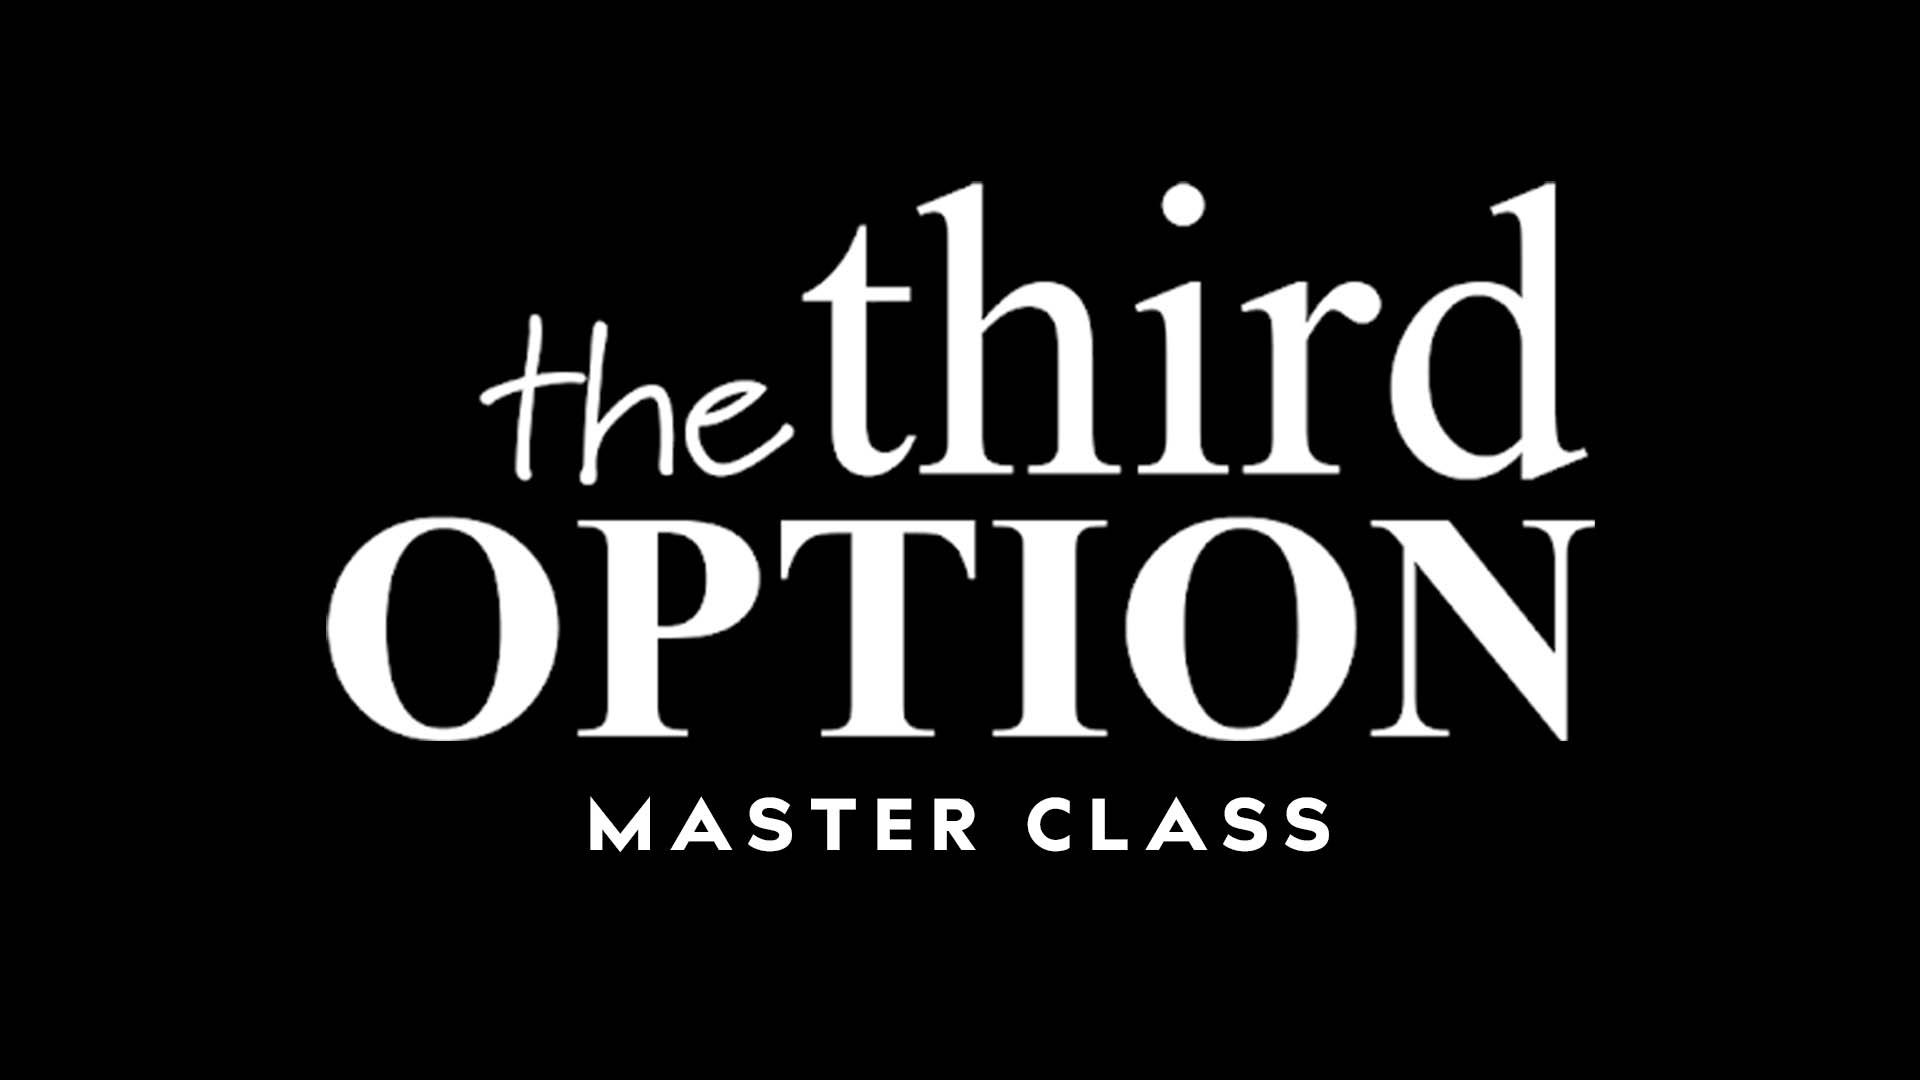 The Third Option Master Class